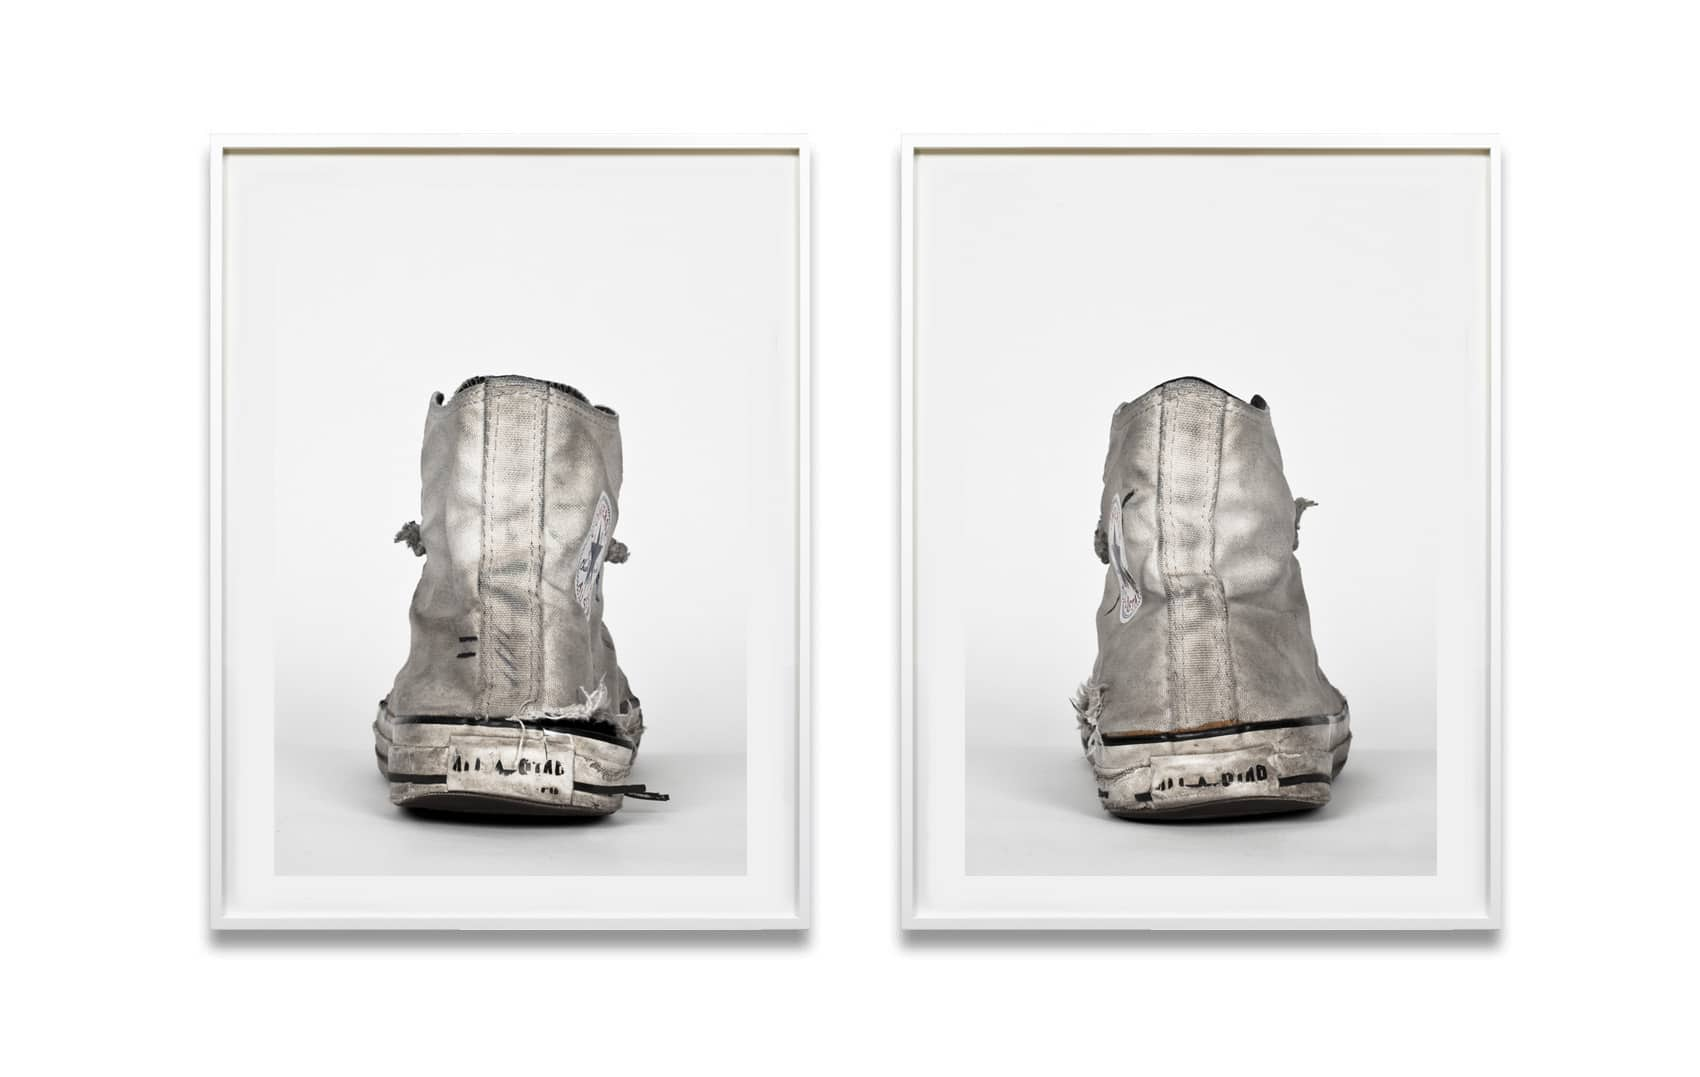 Converse, Silver Hi-Tops, 2012 by Michael Schachtner_Crane Kalman Brighton